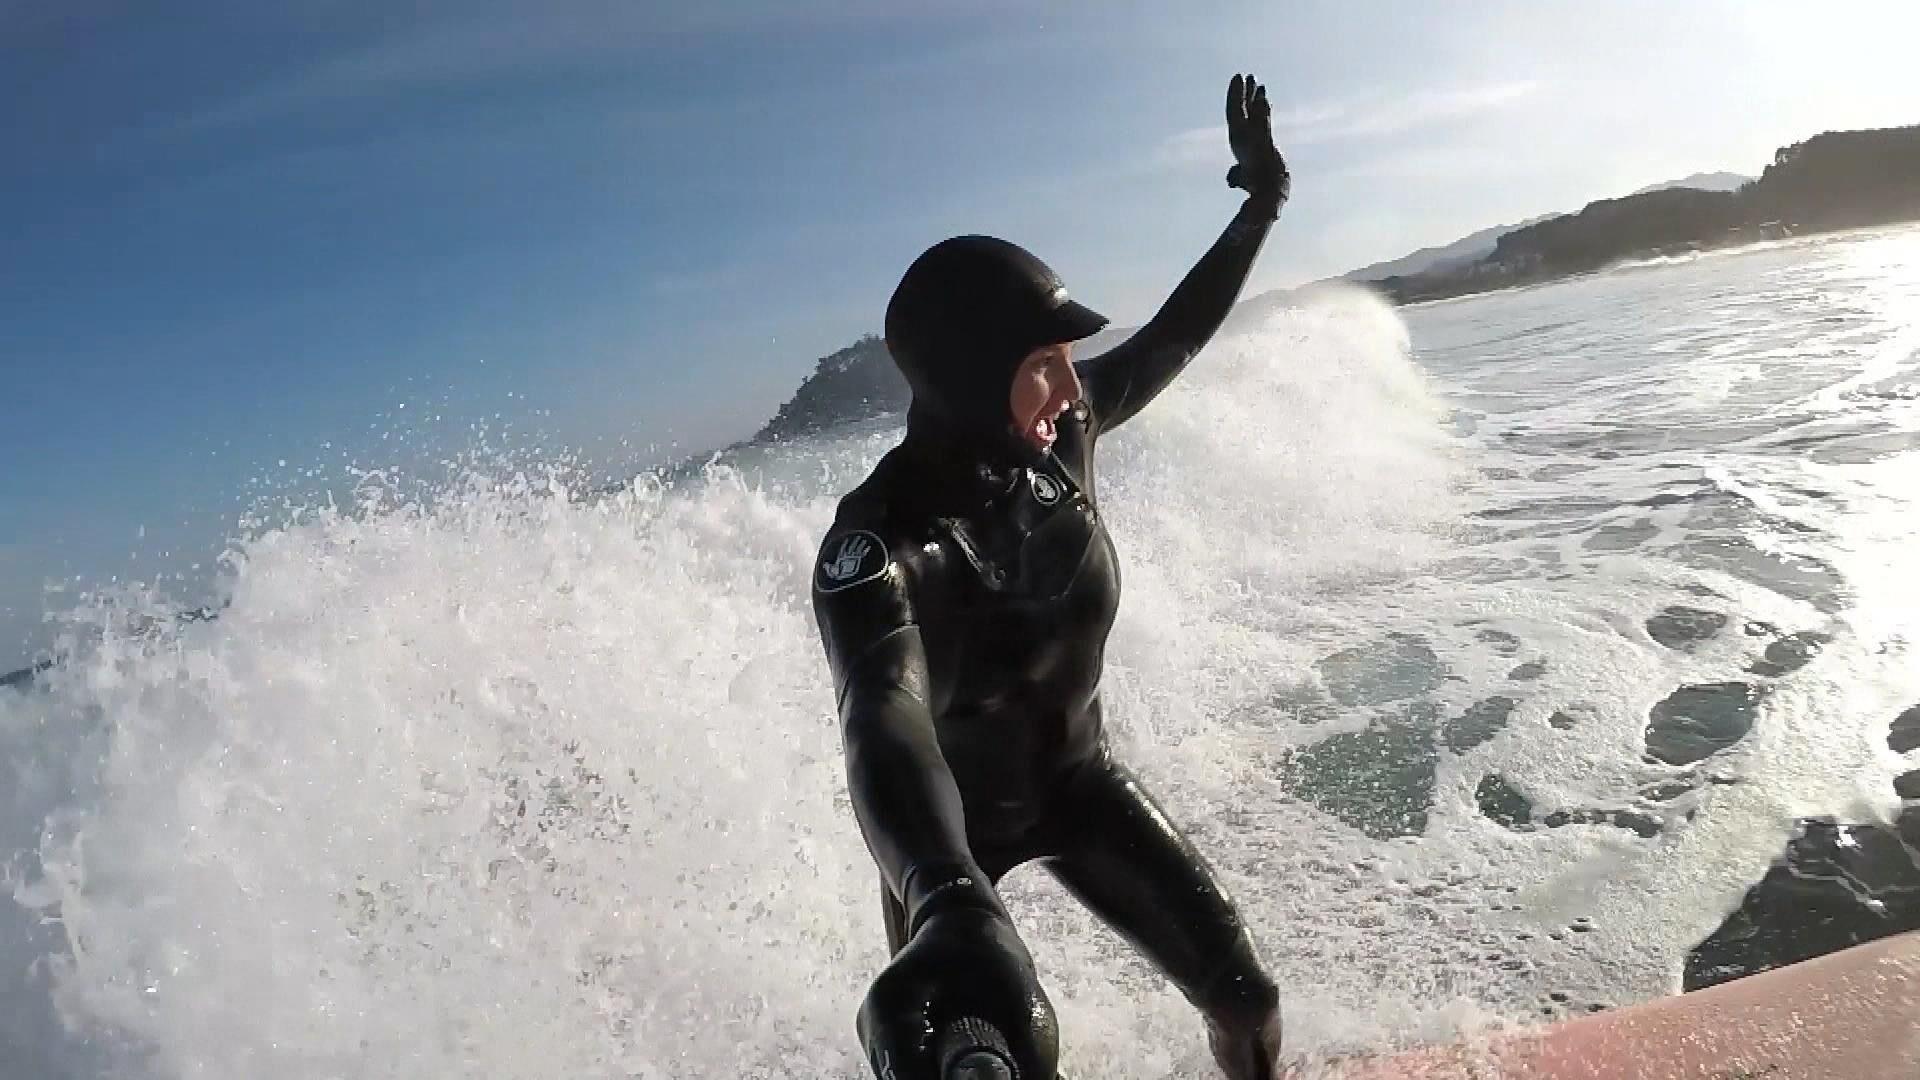 mancuso surfs_297238